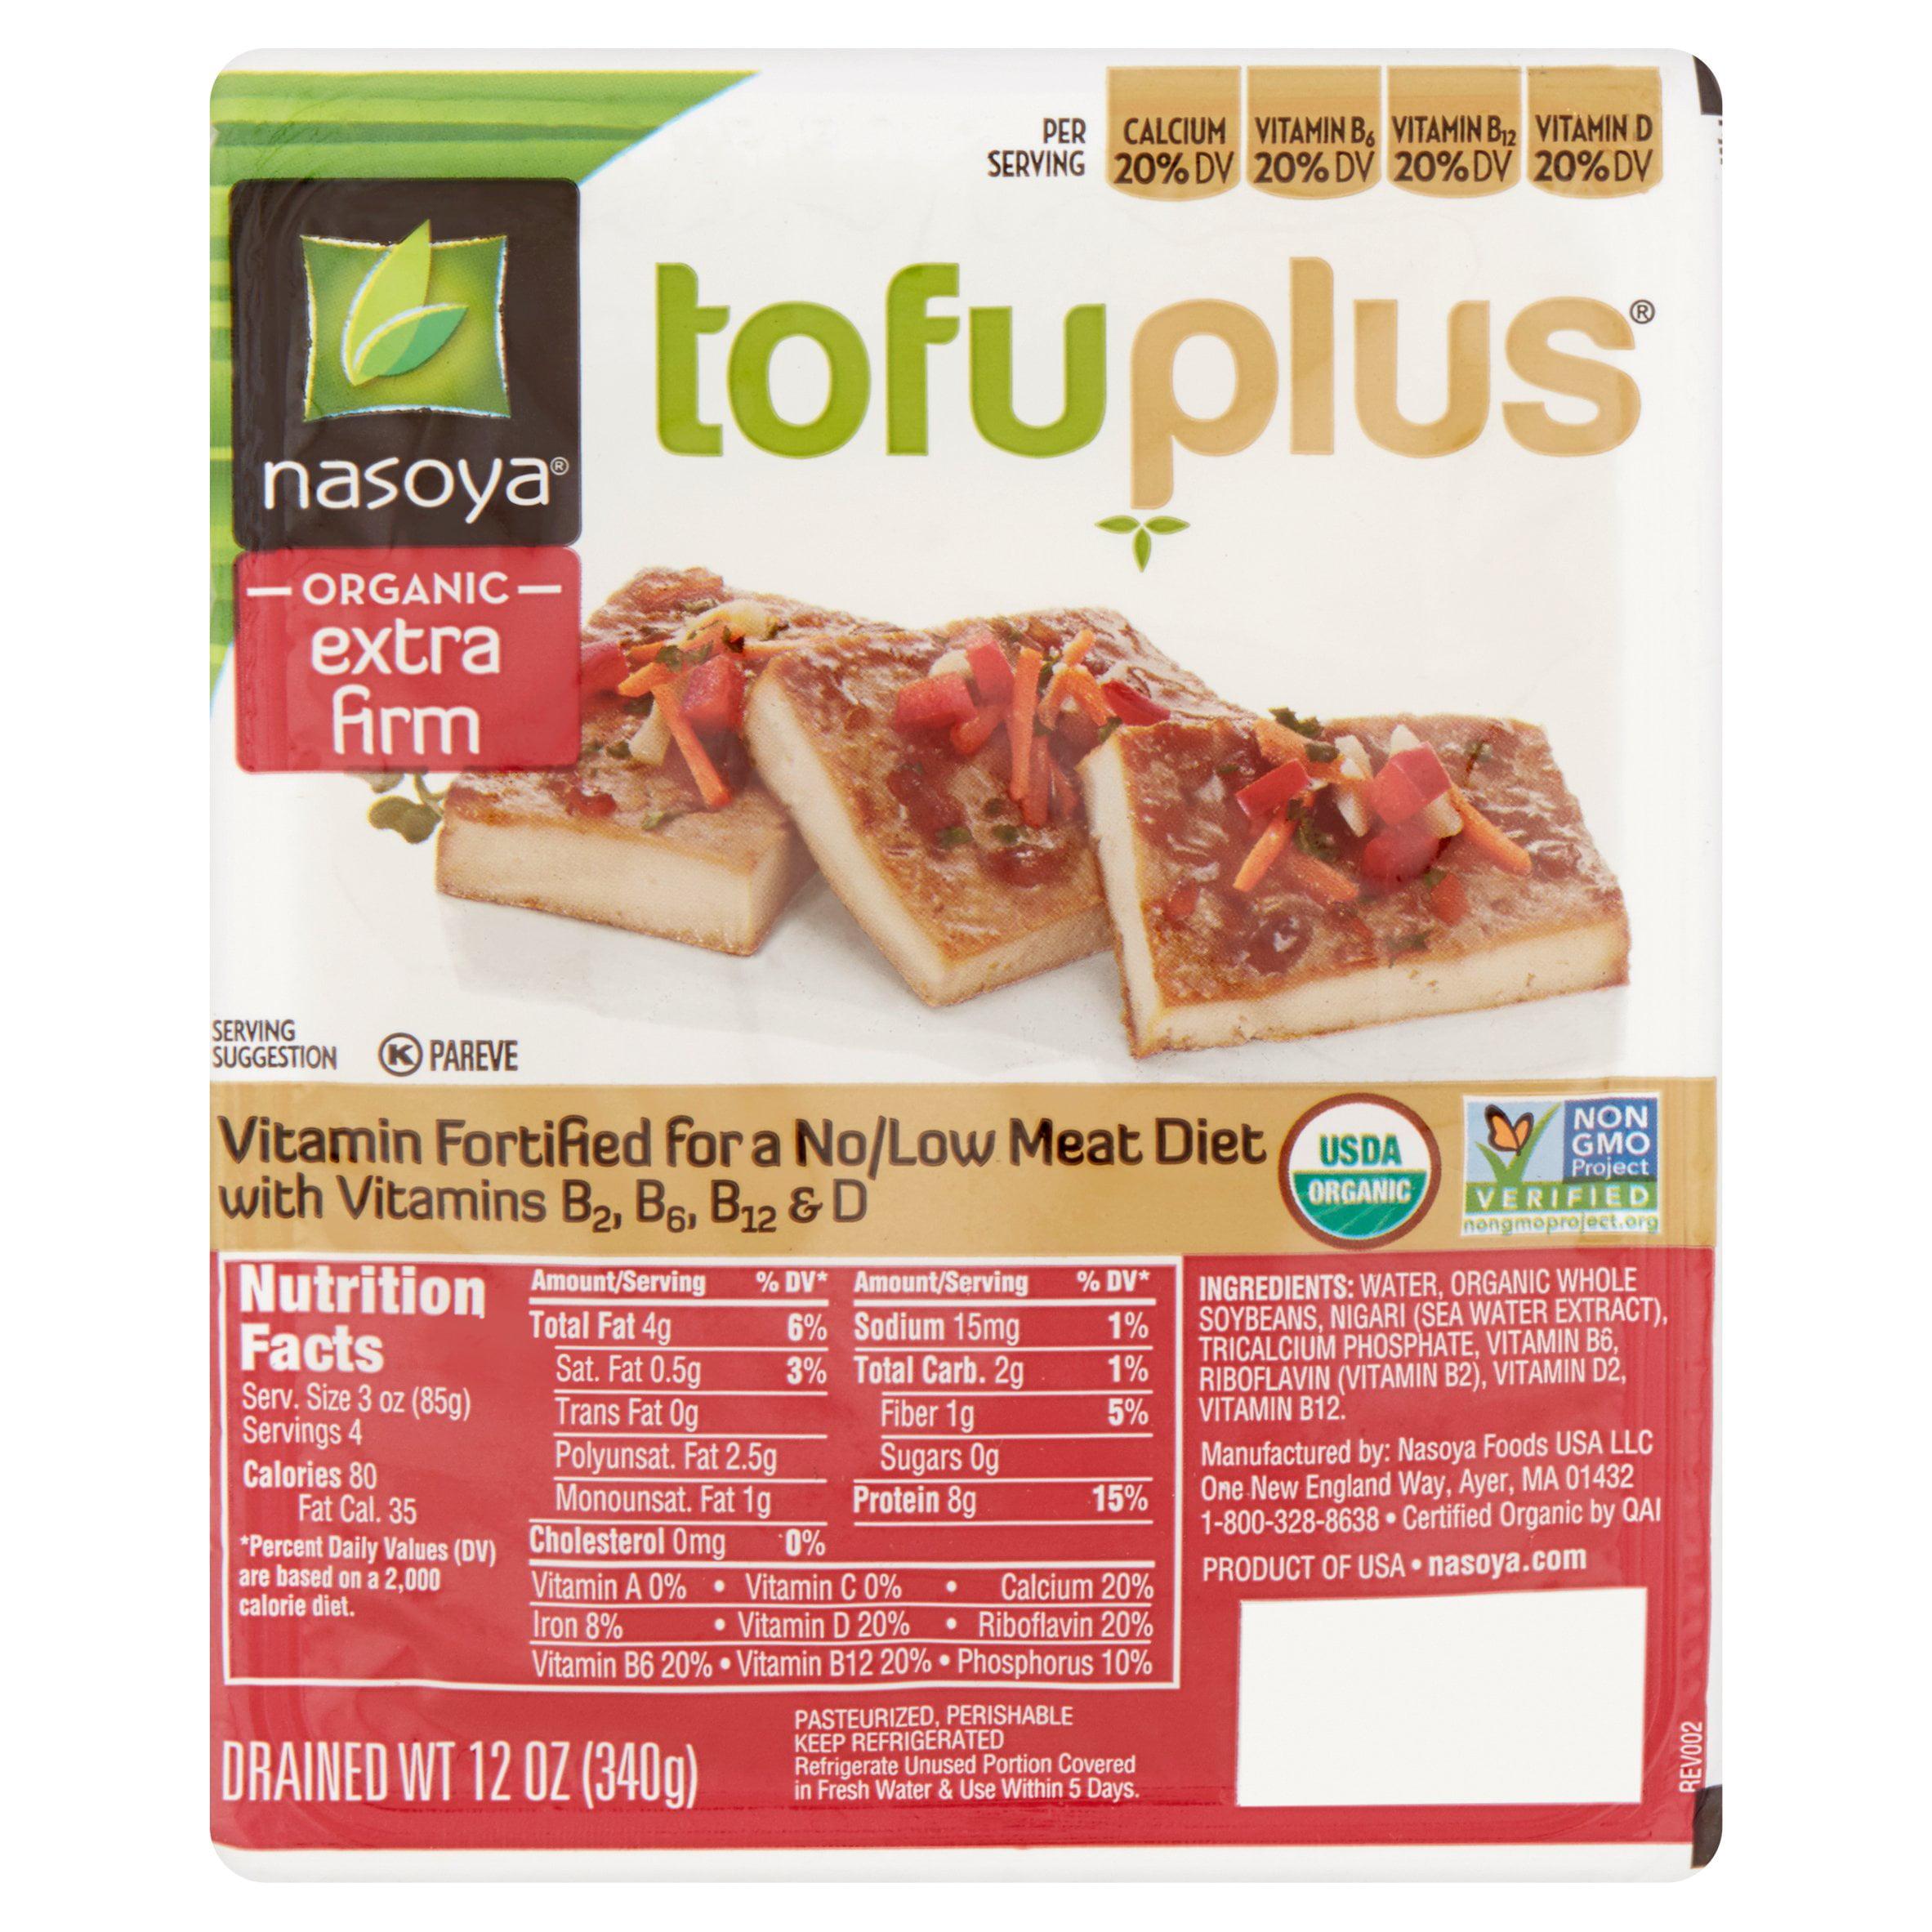 Nasoya Tofuplus Organic Extra Firm Tofu, 12 oz